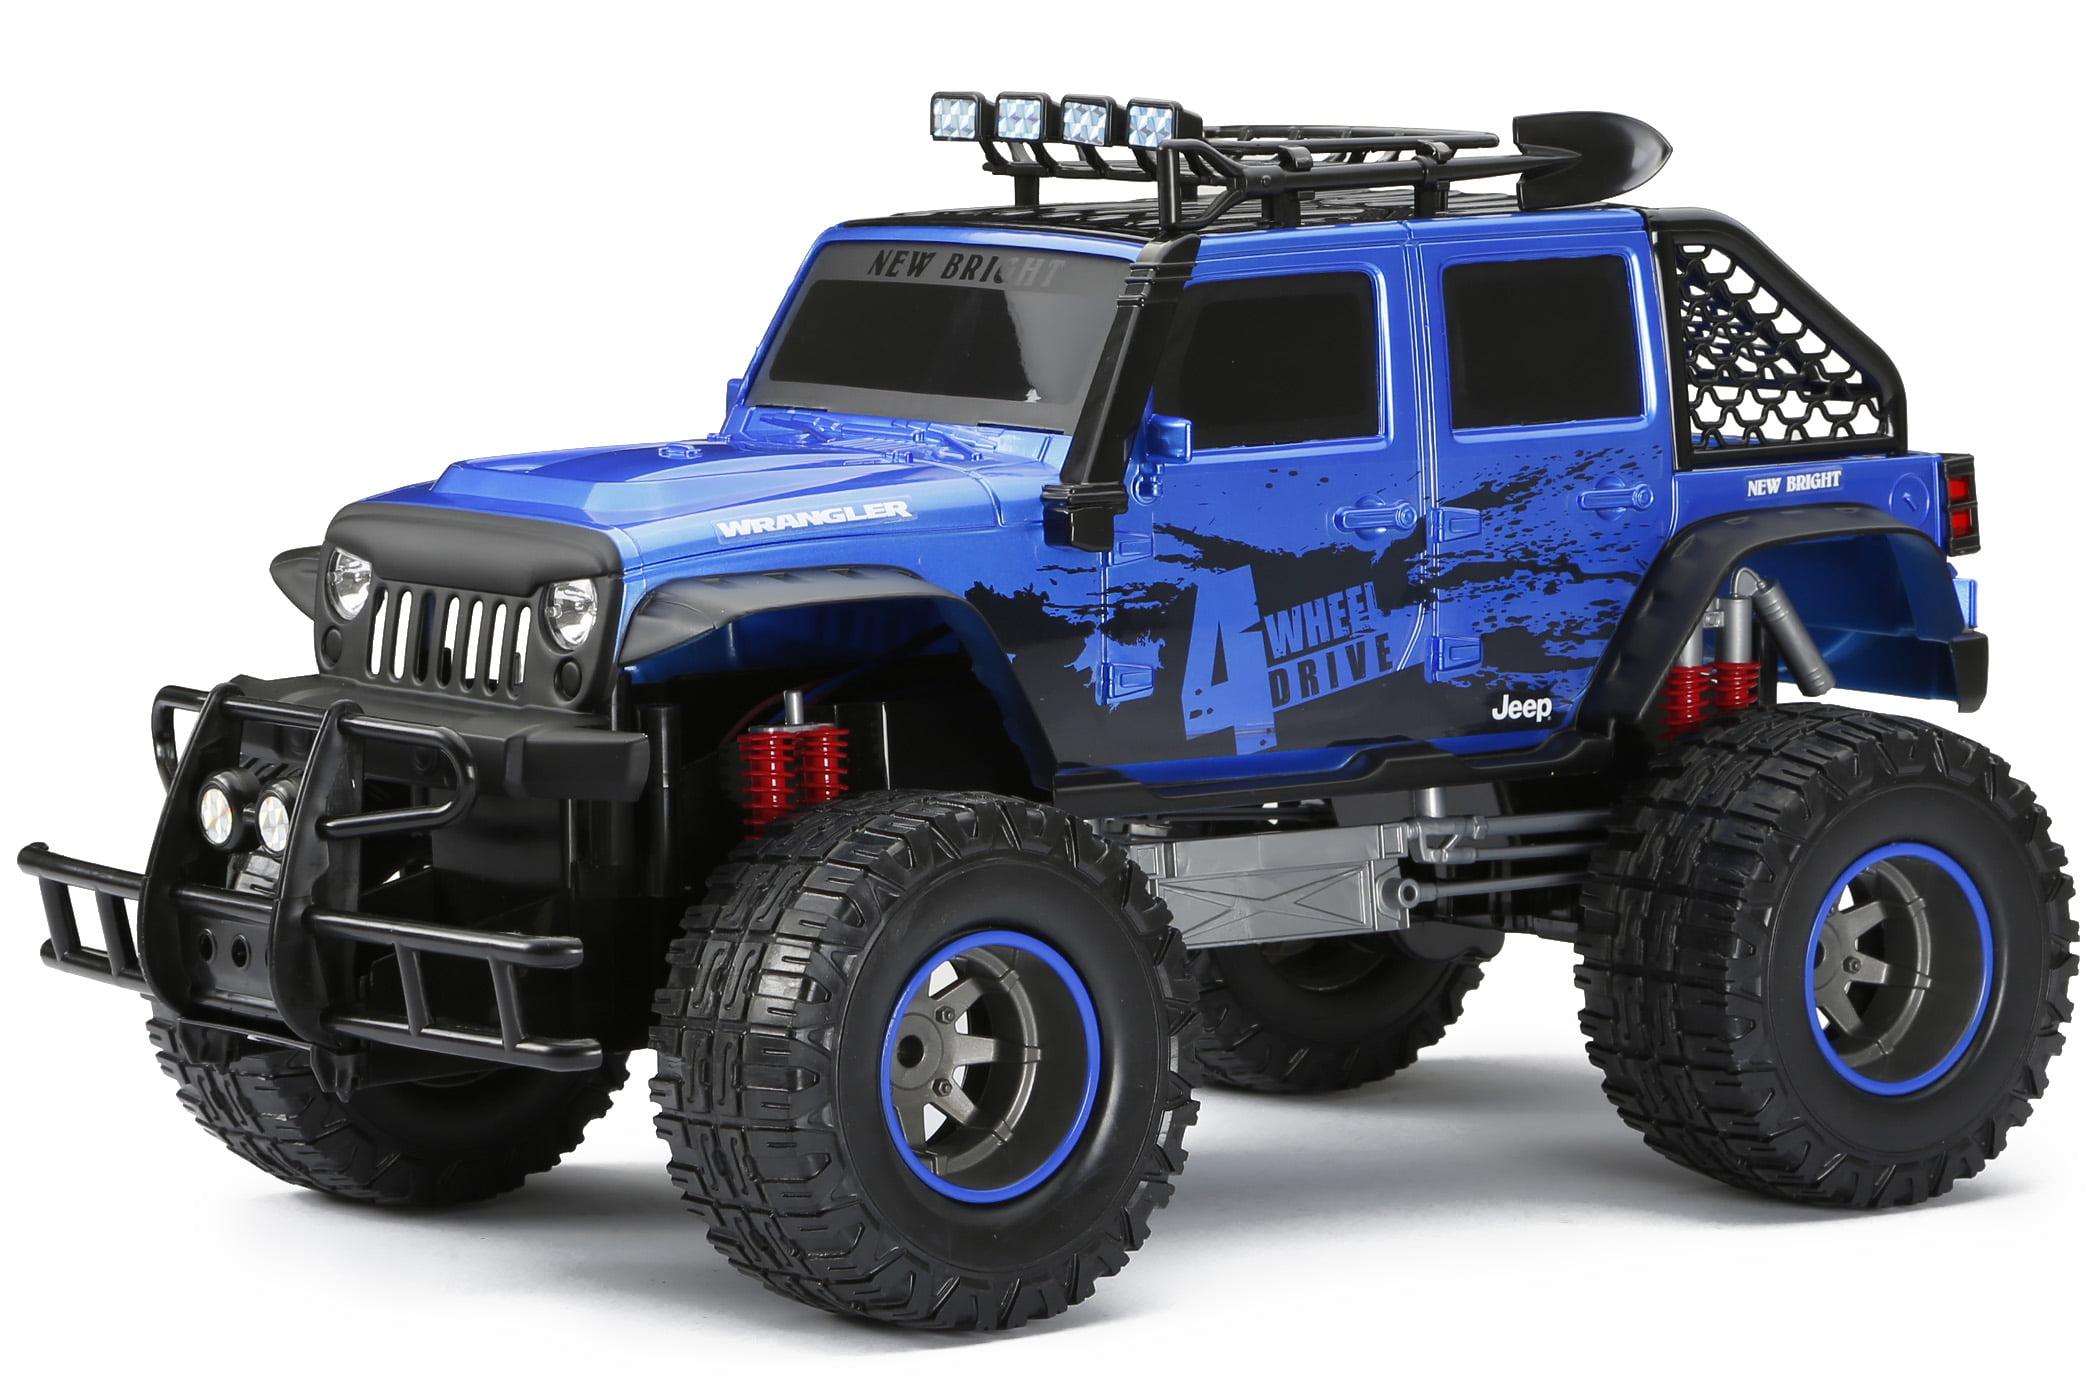 New Bright 1:12 Radio Control 4x4 4-door Jeep Blue by New Bright